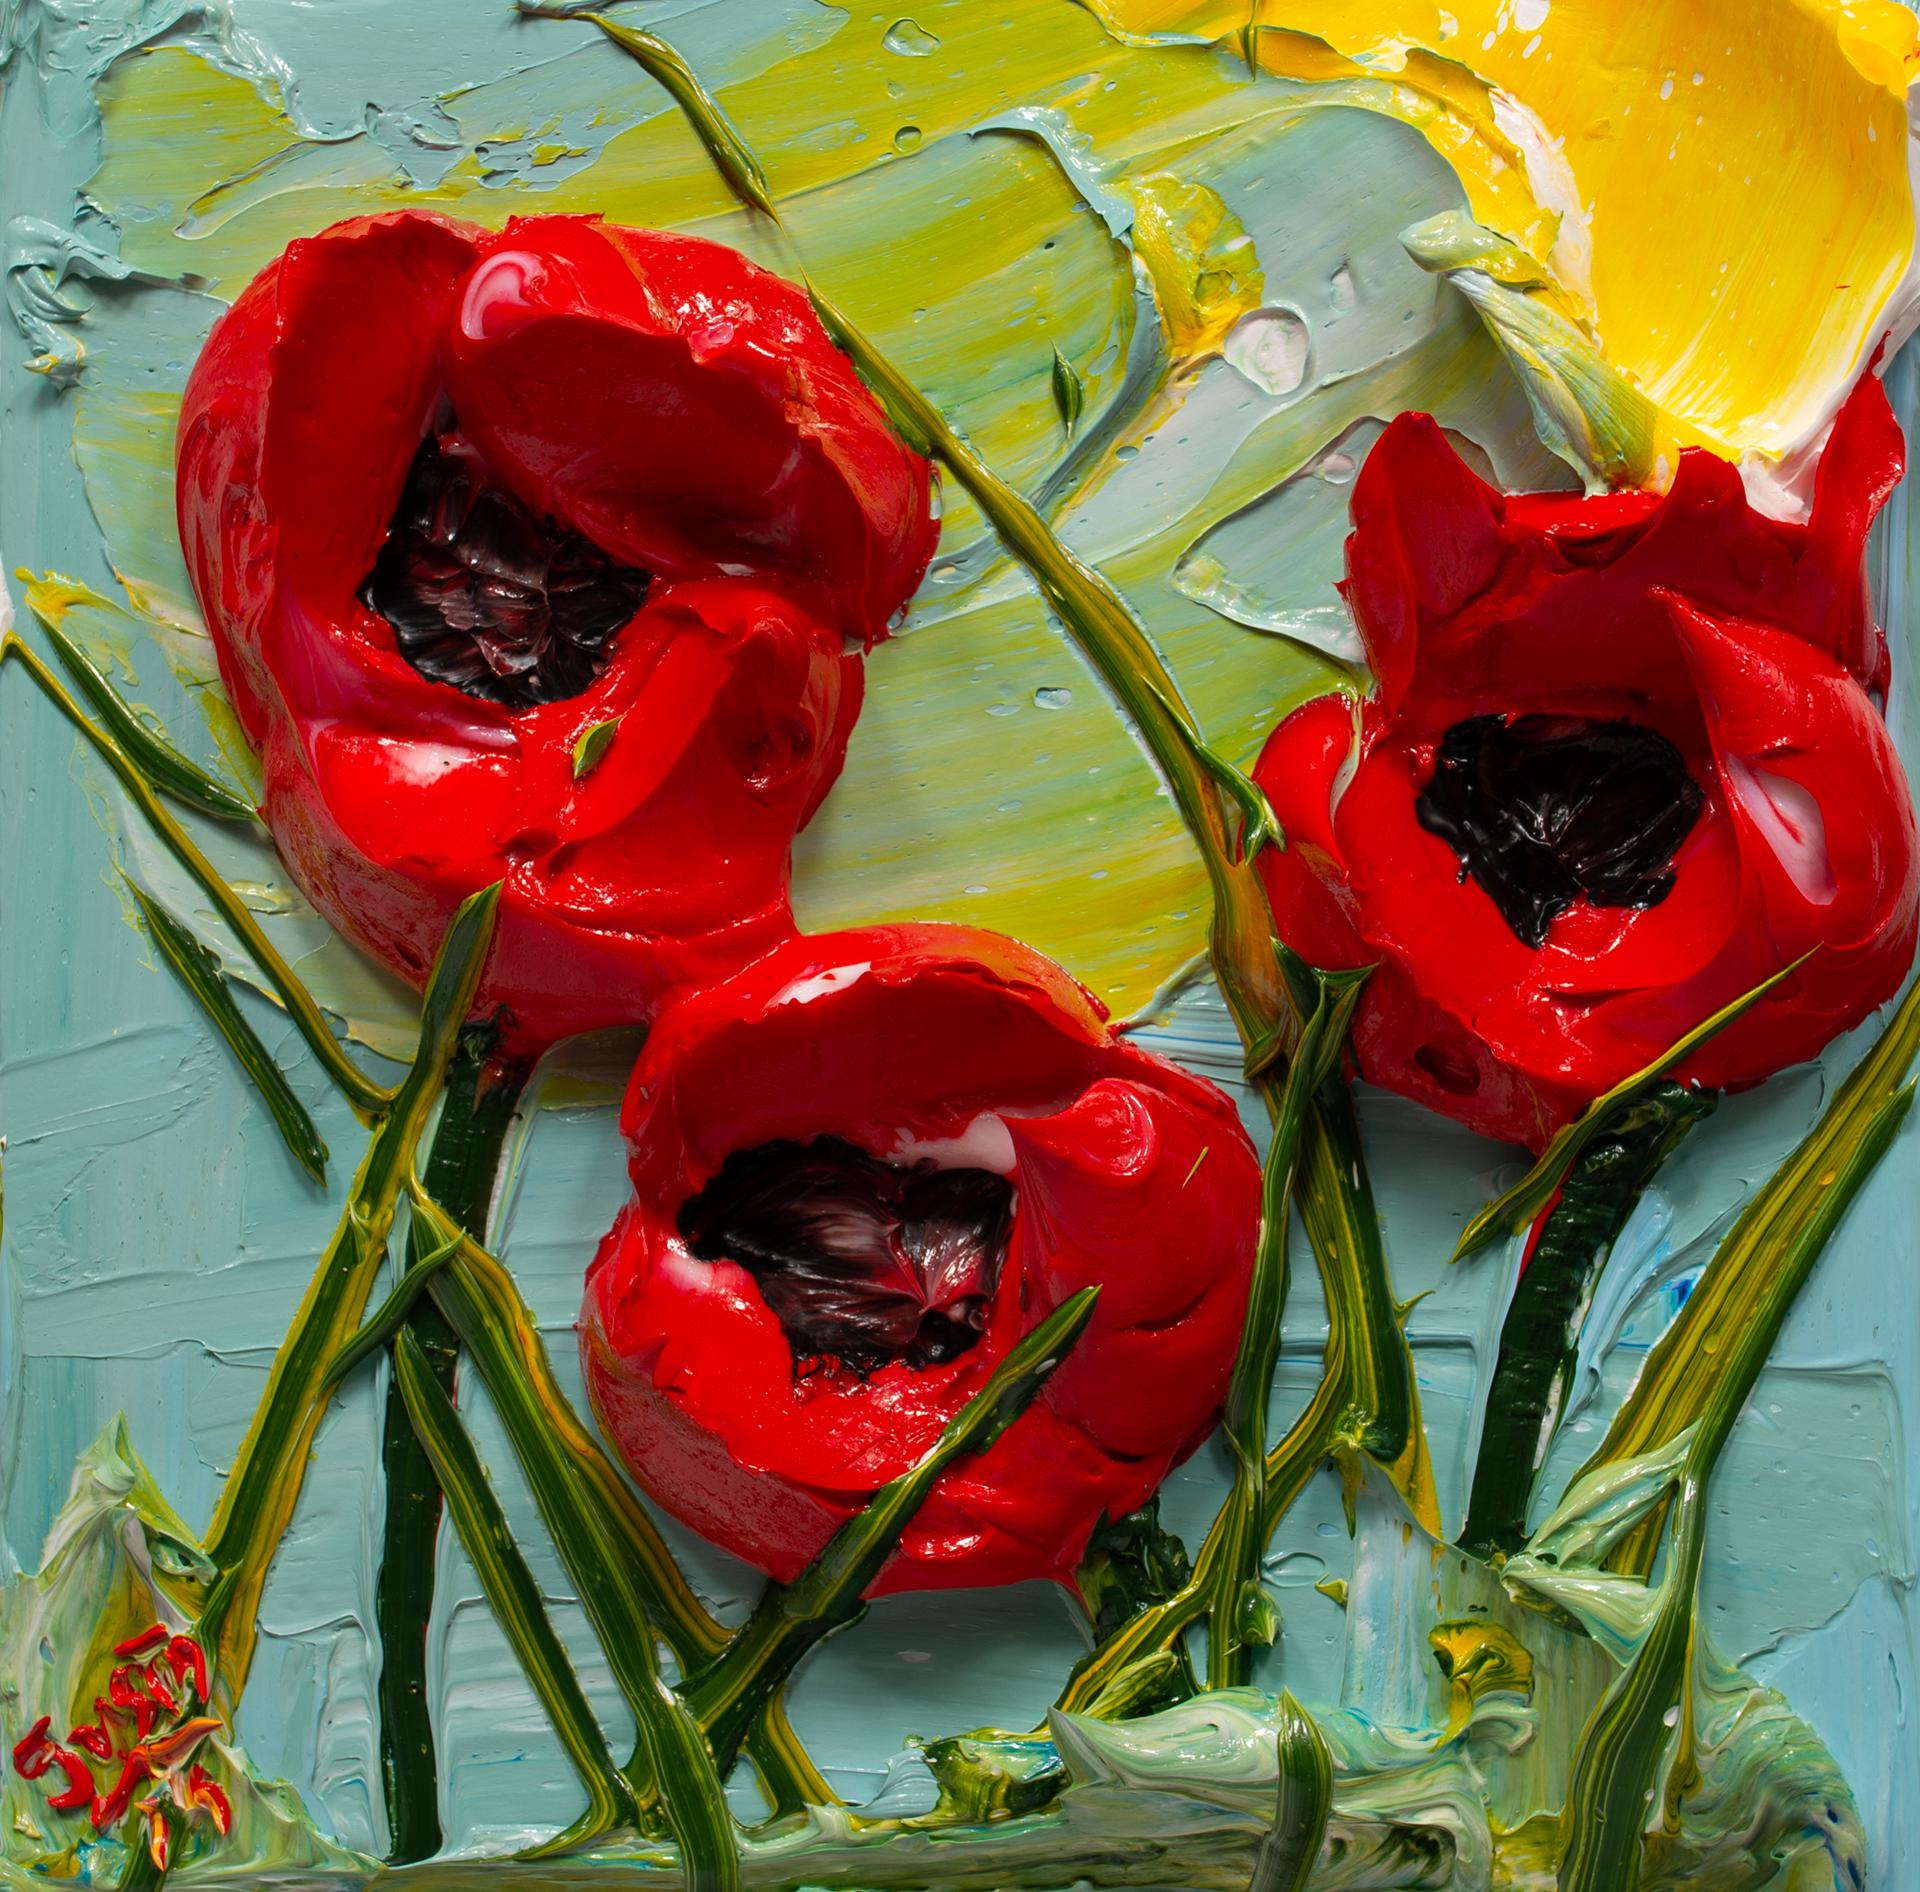 POPPY FLOWERS-PF-12X12-2019-178 by JUSTIN GAFFREY